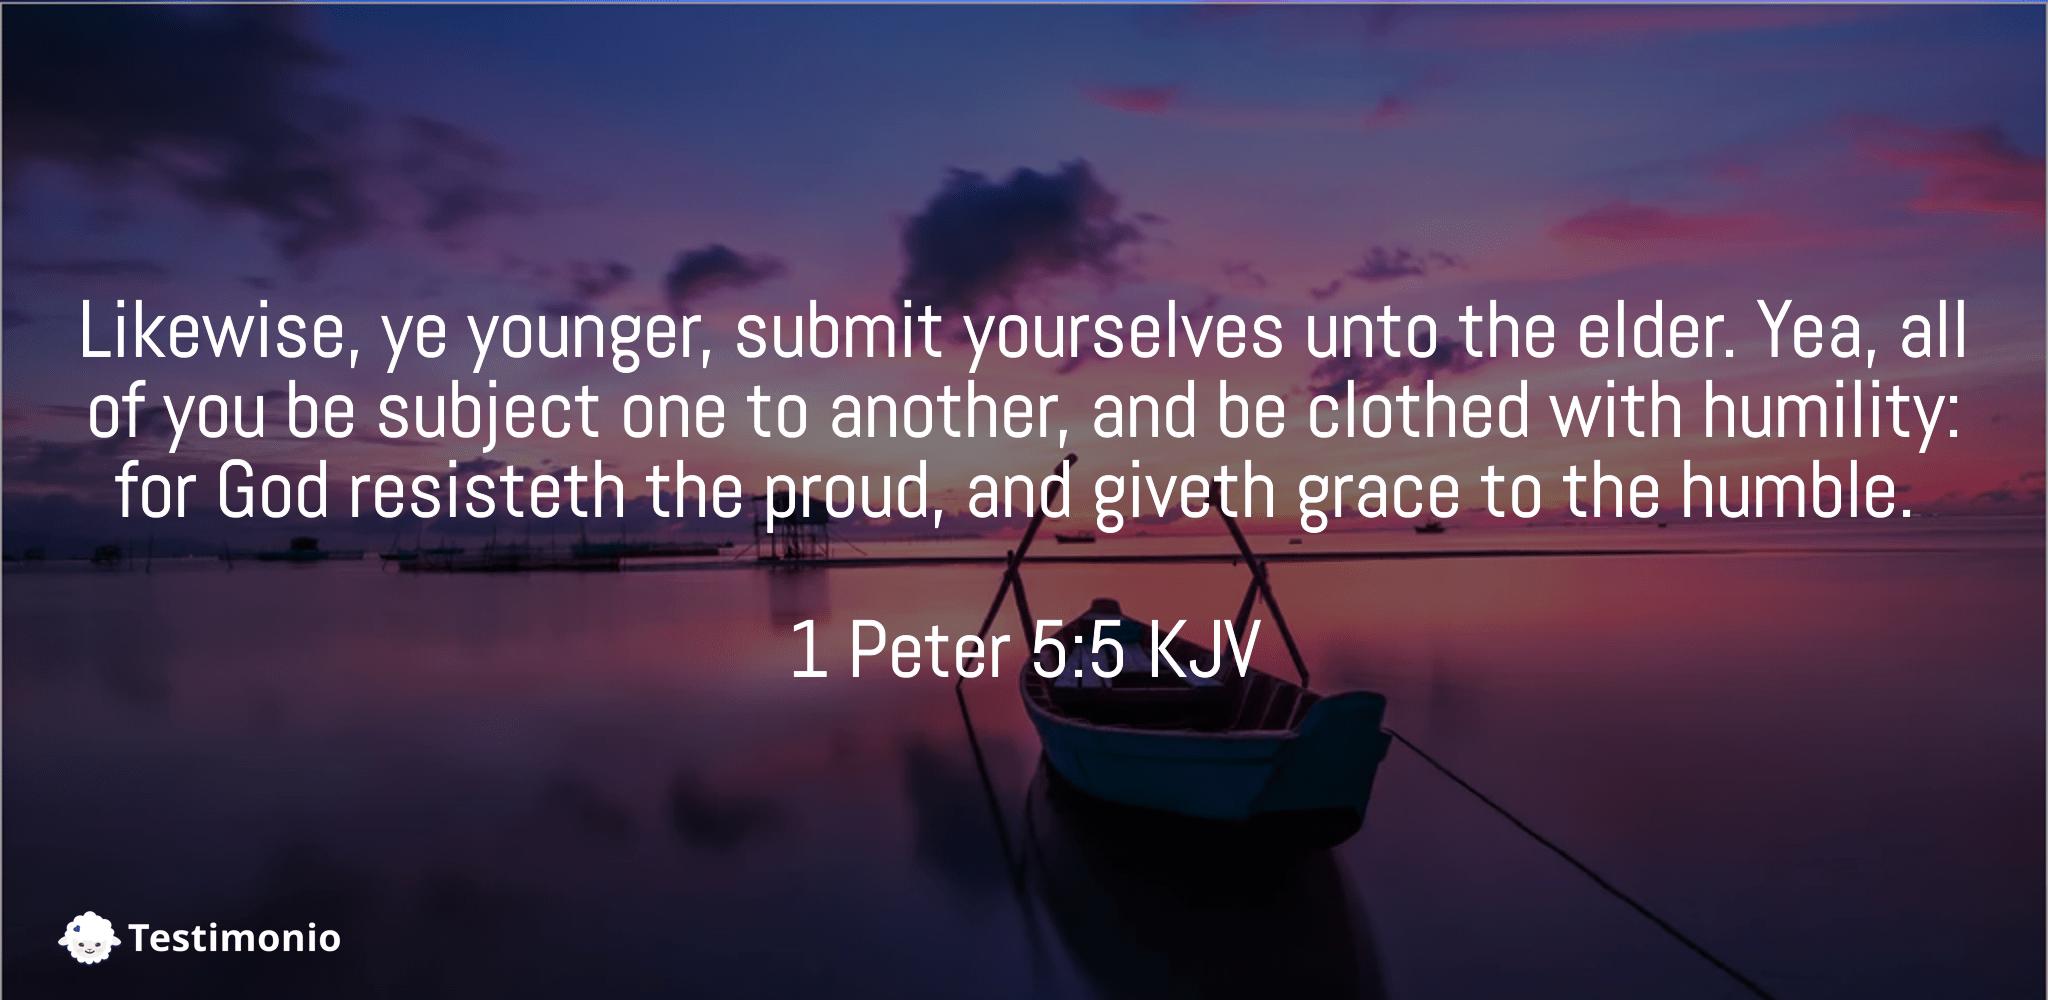 1 Peter 5:5